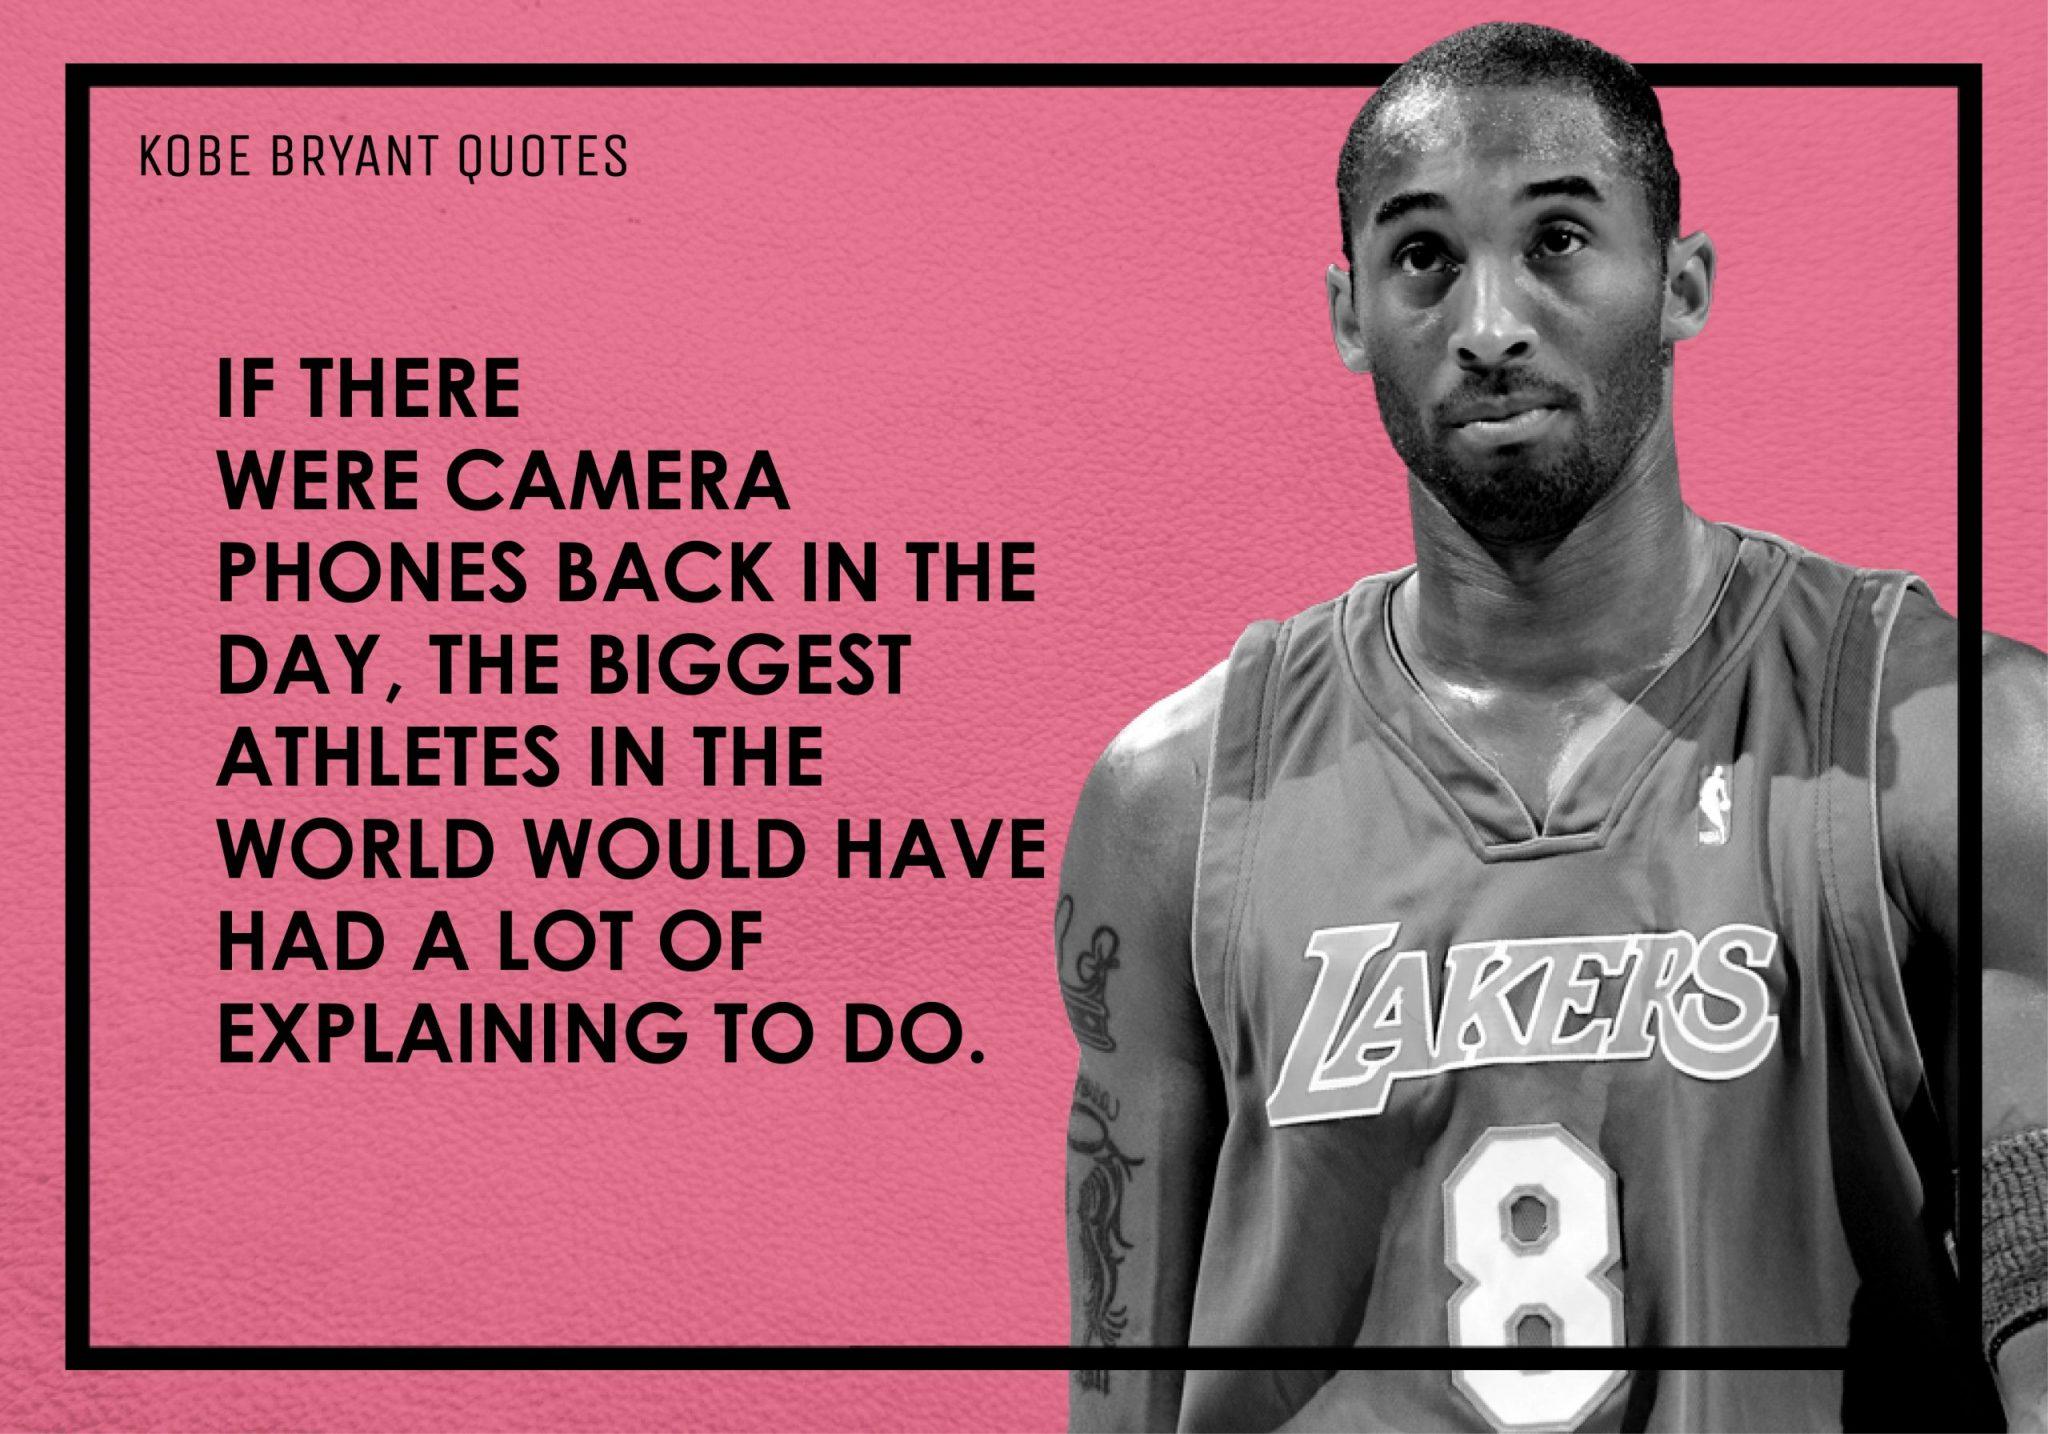 Kobe Bryant Quotes (14)